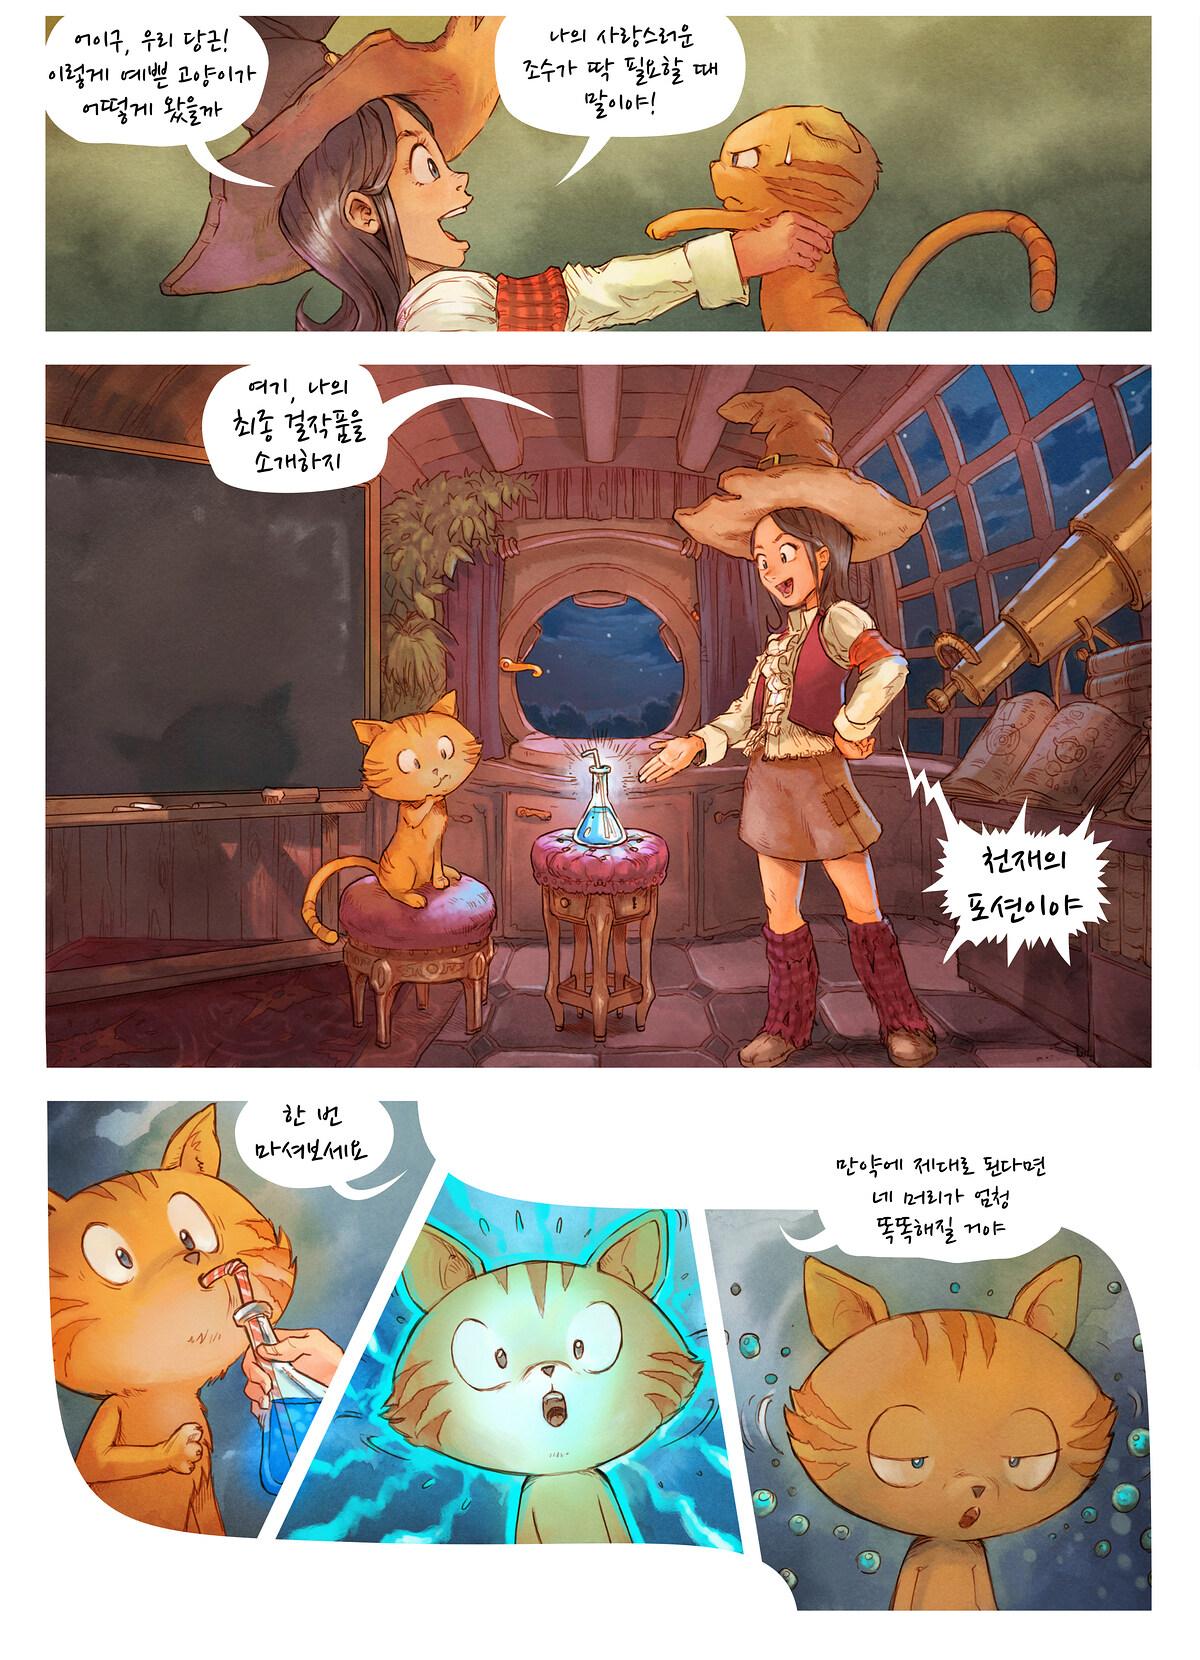 A webcomic page of Pepper&Carrot, 에피소드 4 [kr], 페이지 3